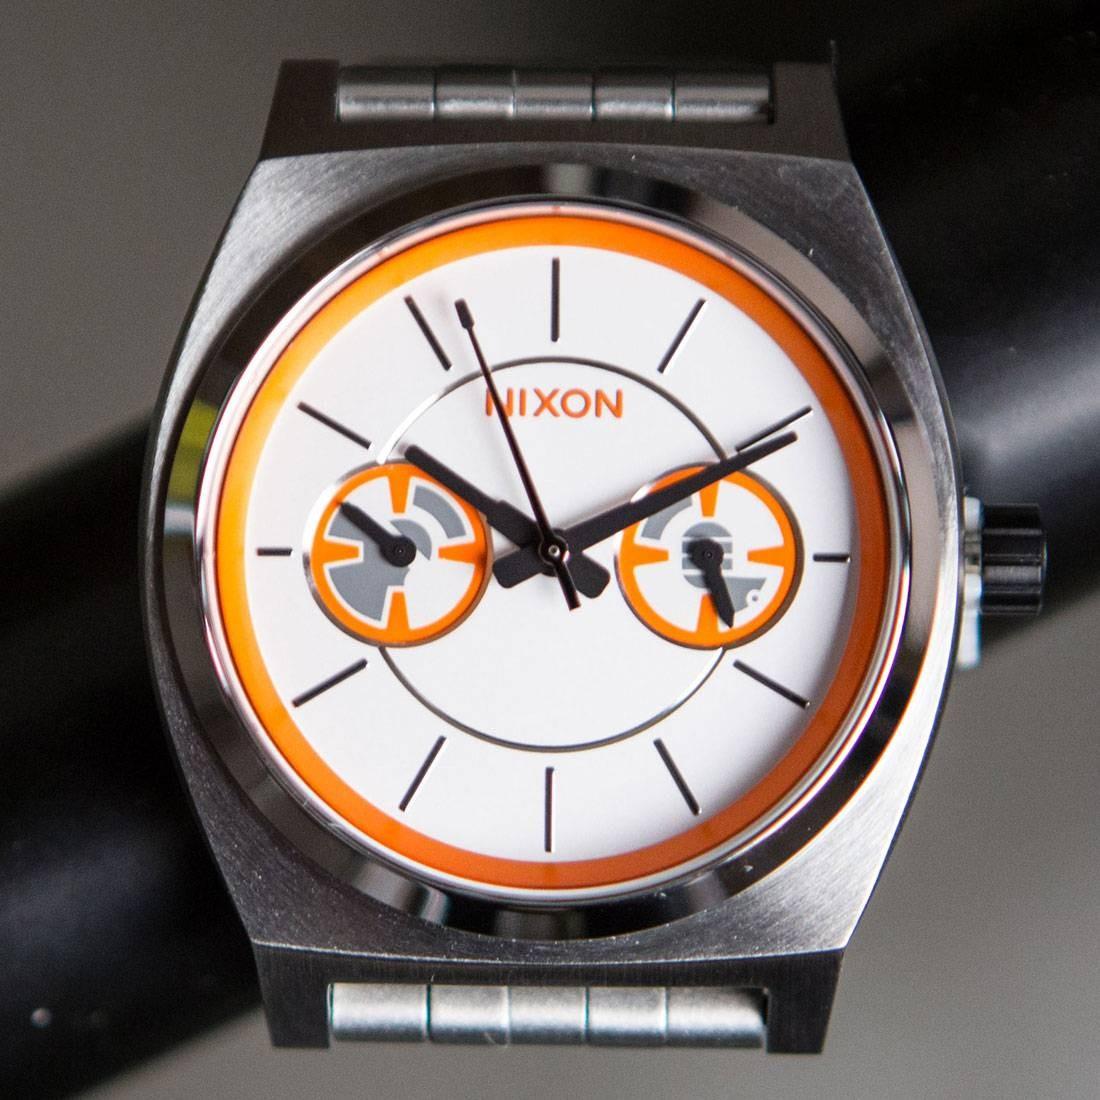 Nixon x Star Wars Time Teller Deluxe Watch - BB8 (silver / orange)